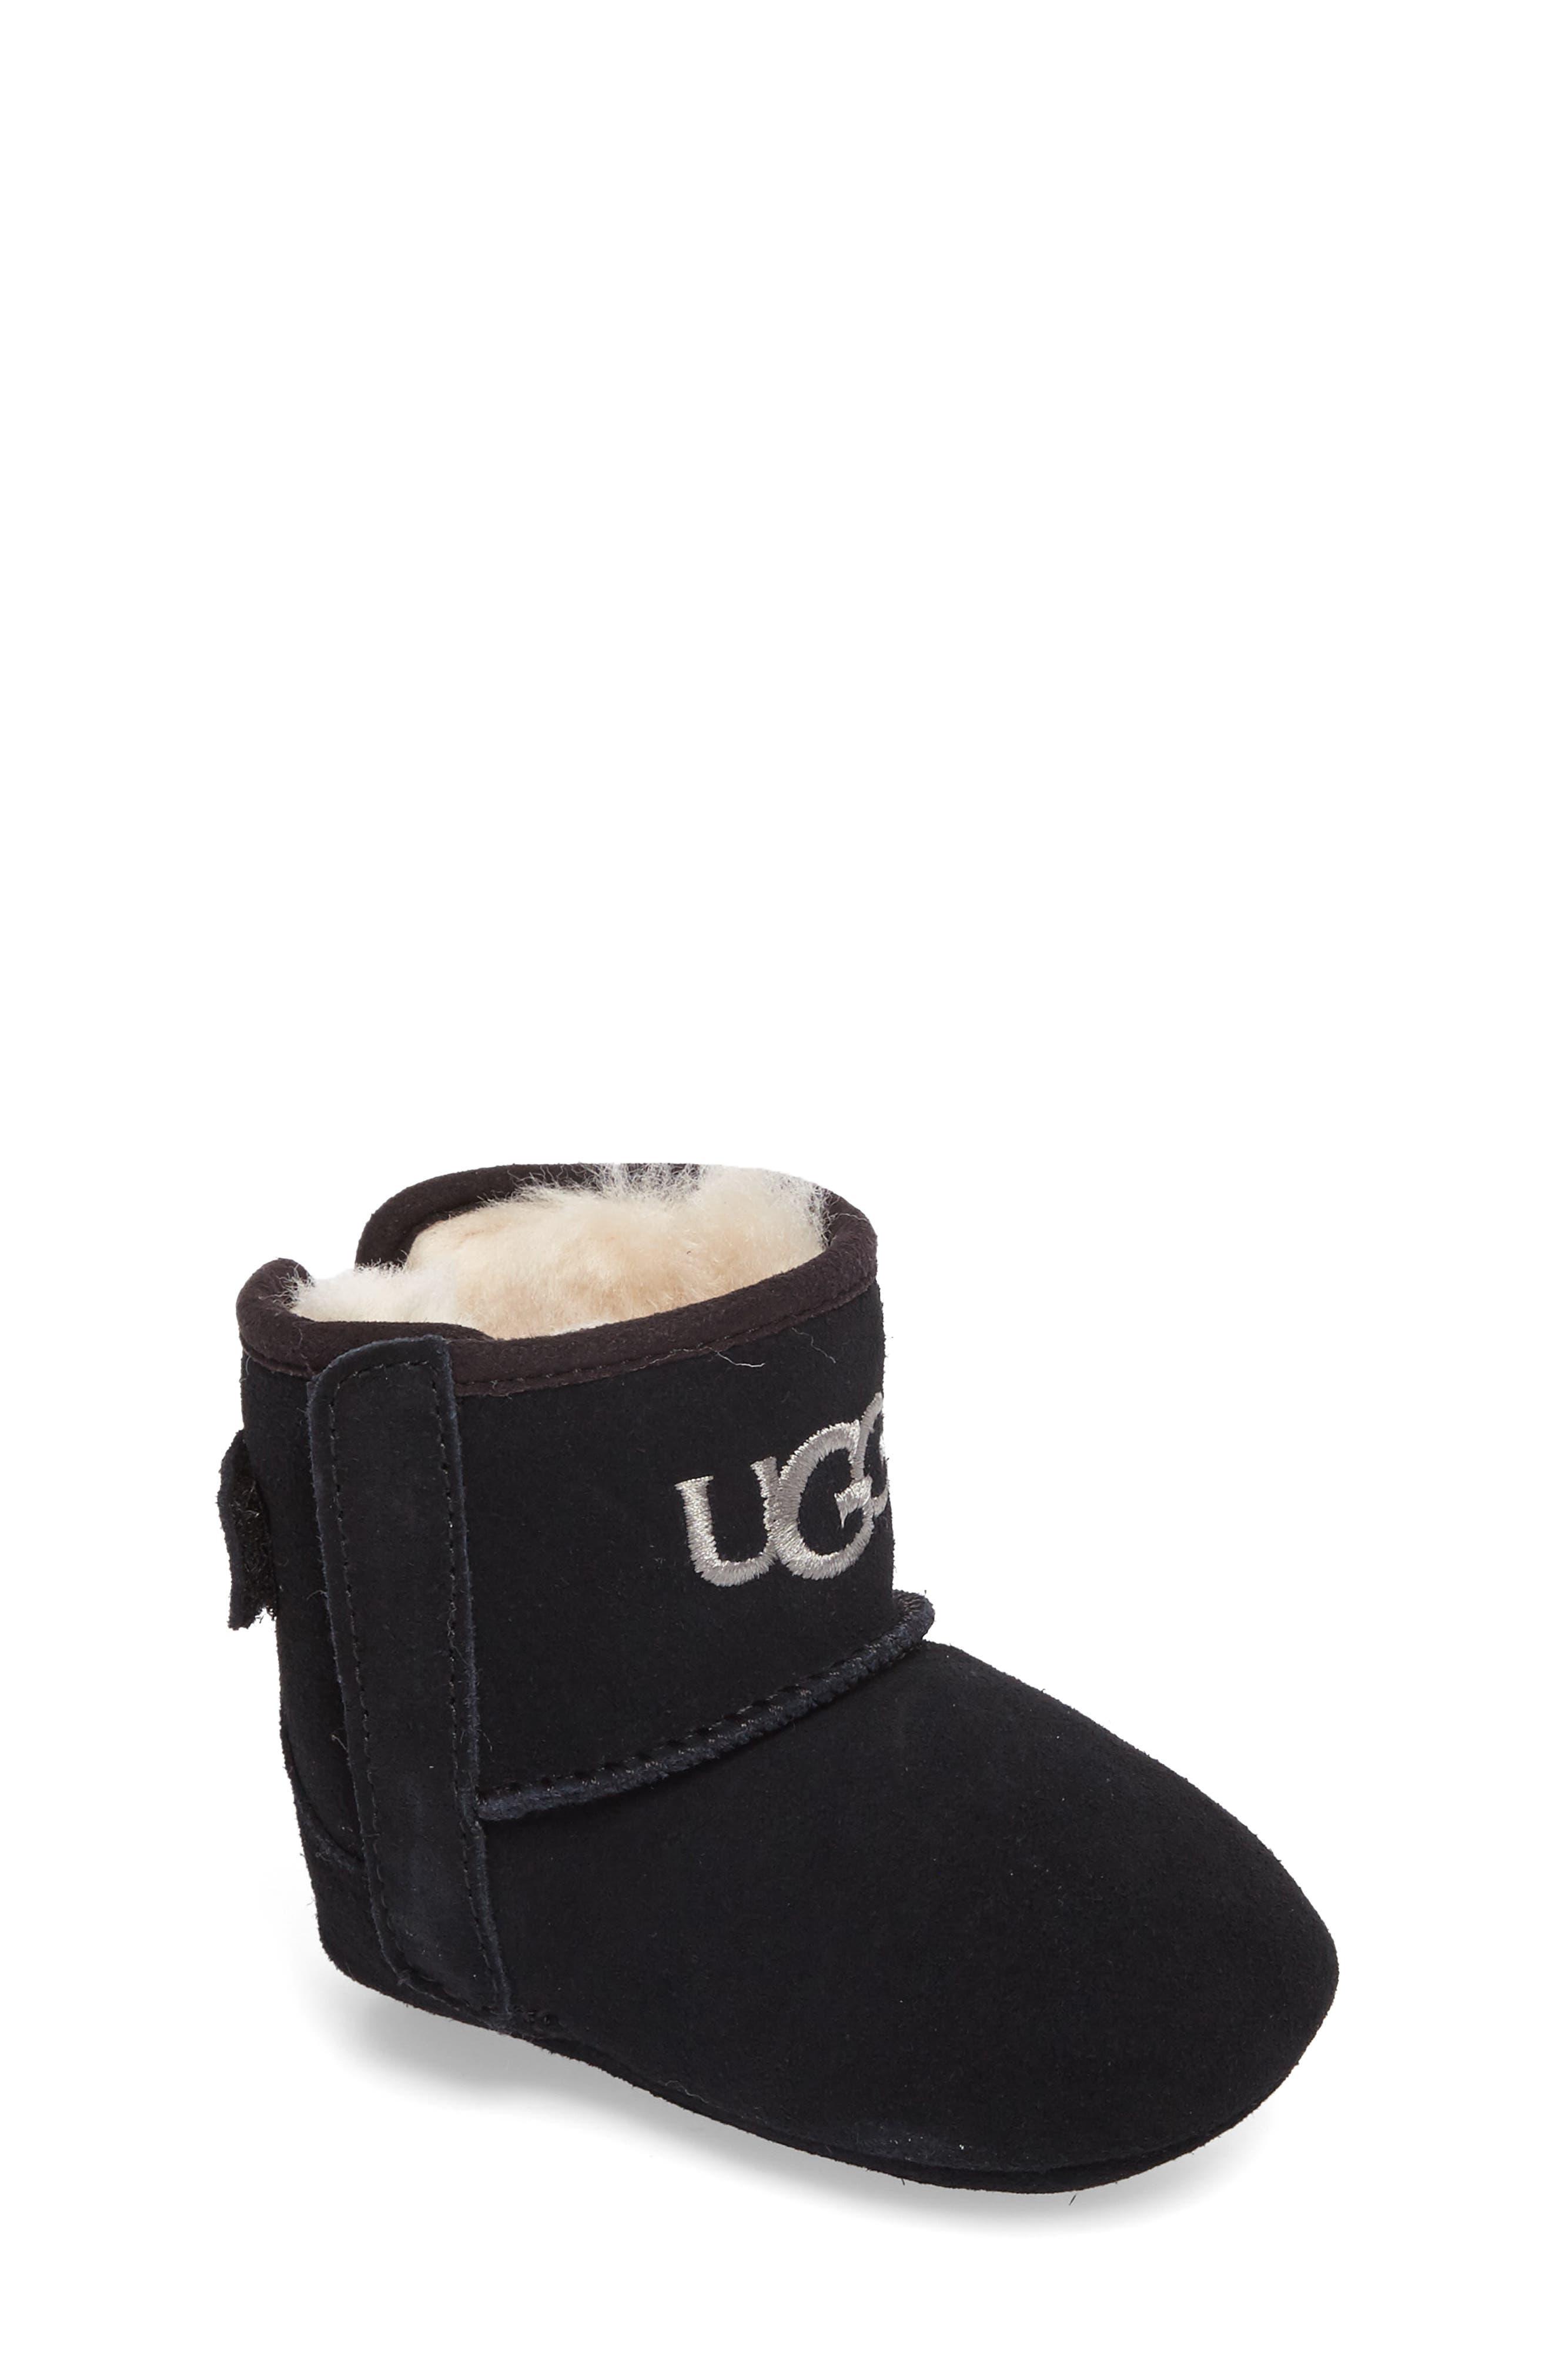 Main Image - UGG® Jesse II Bow Boot (Baby & Walker)